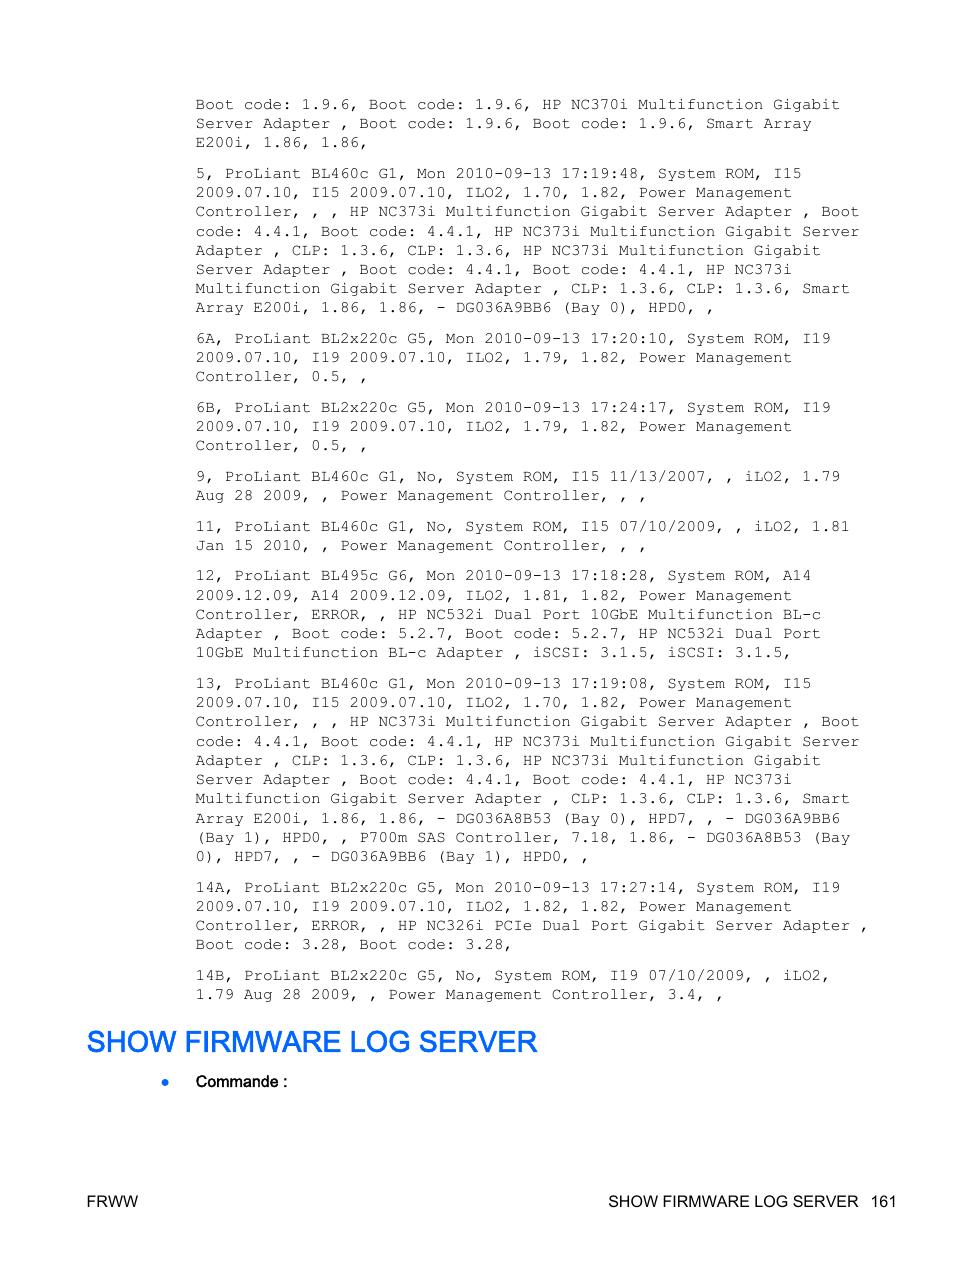 Show firmware log server   HP Onboard Administrator Manuel d